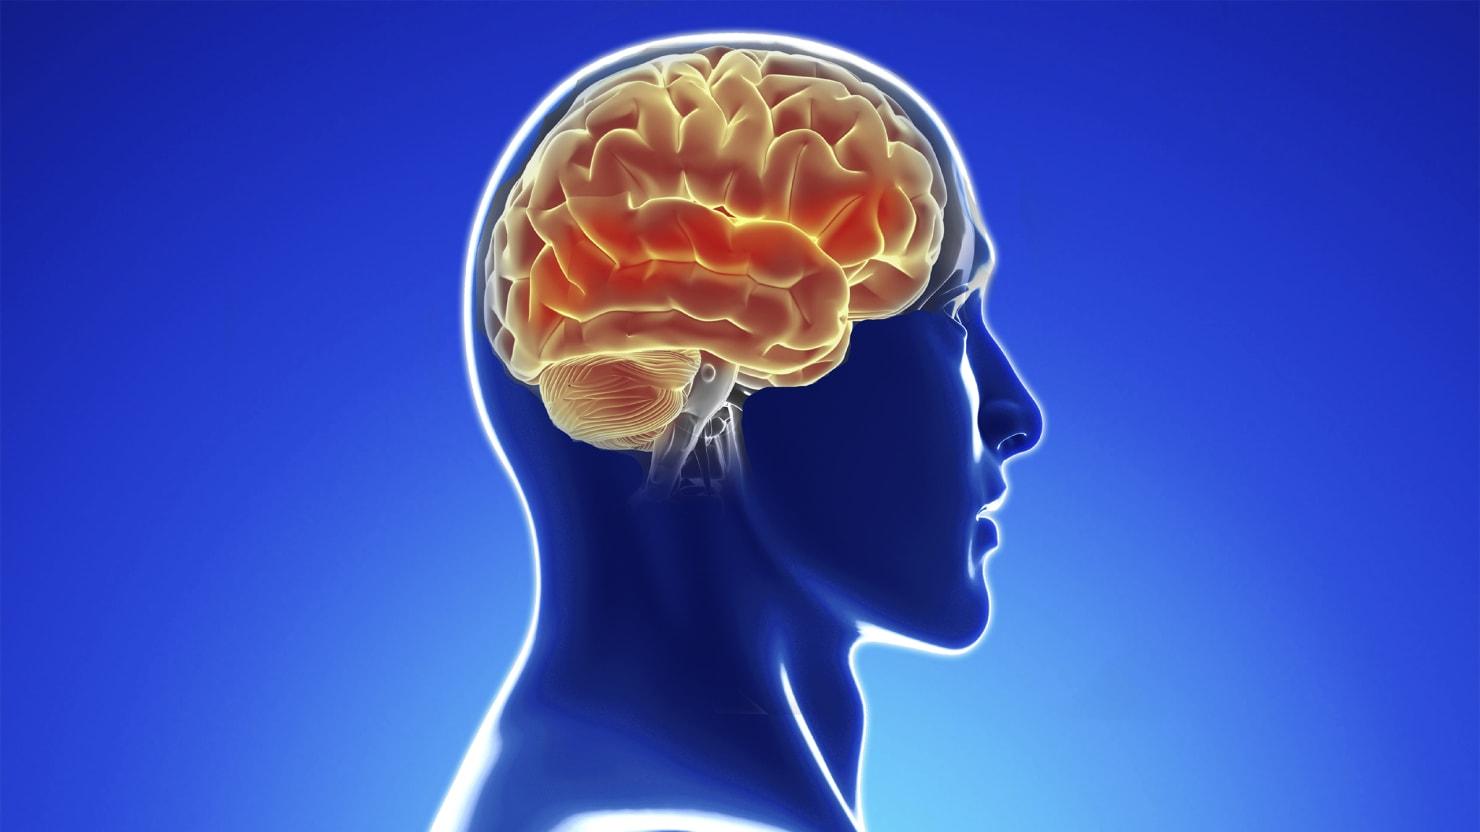 Pioneering Neuroscientists Breach the Blood-Brain Barrier